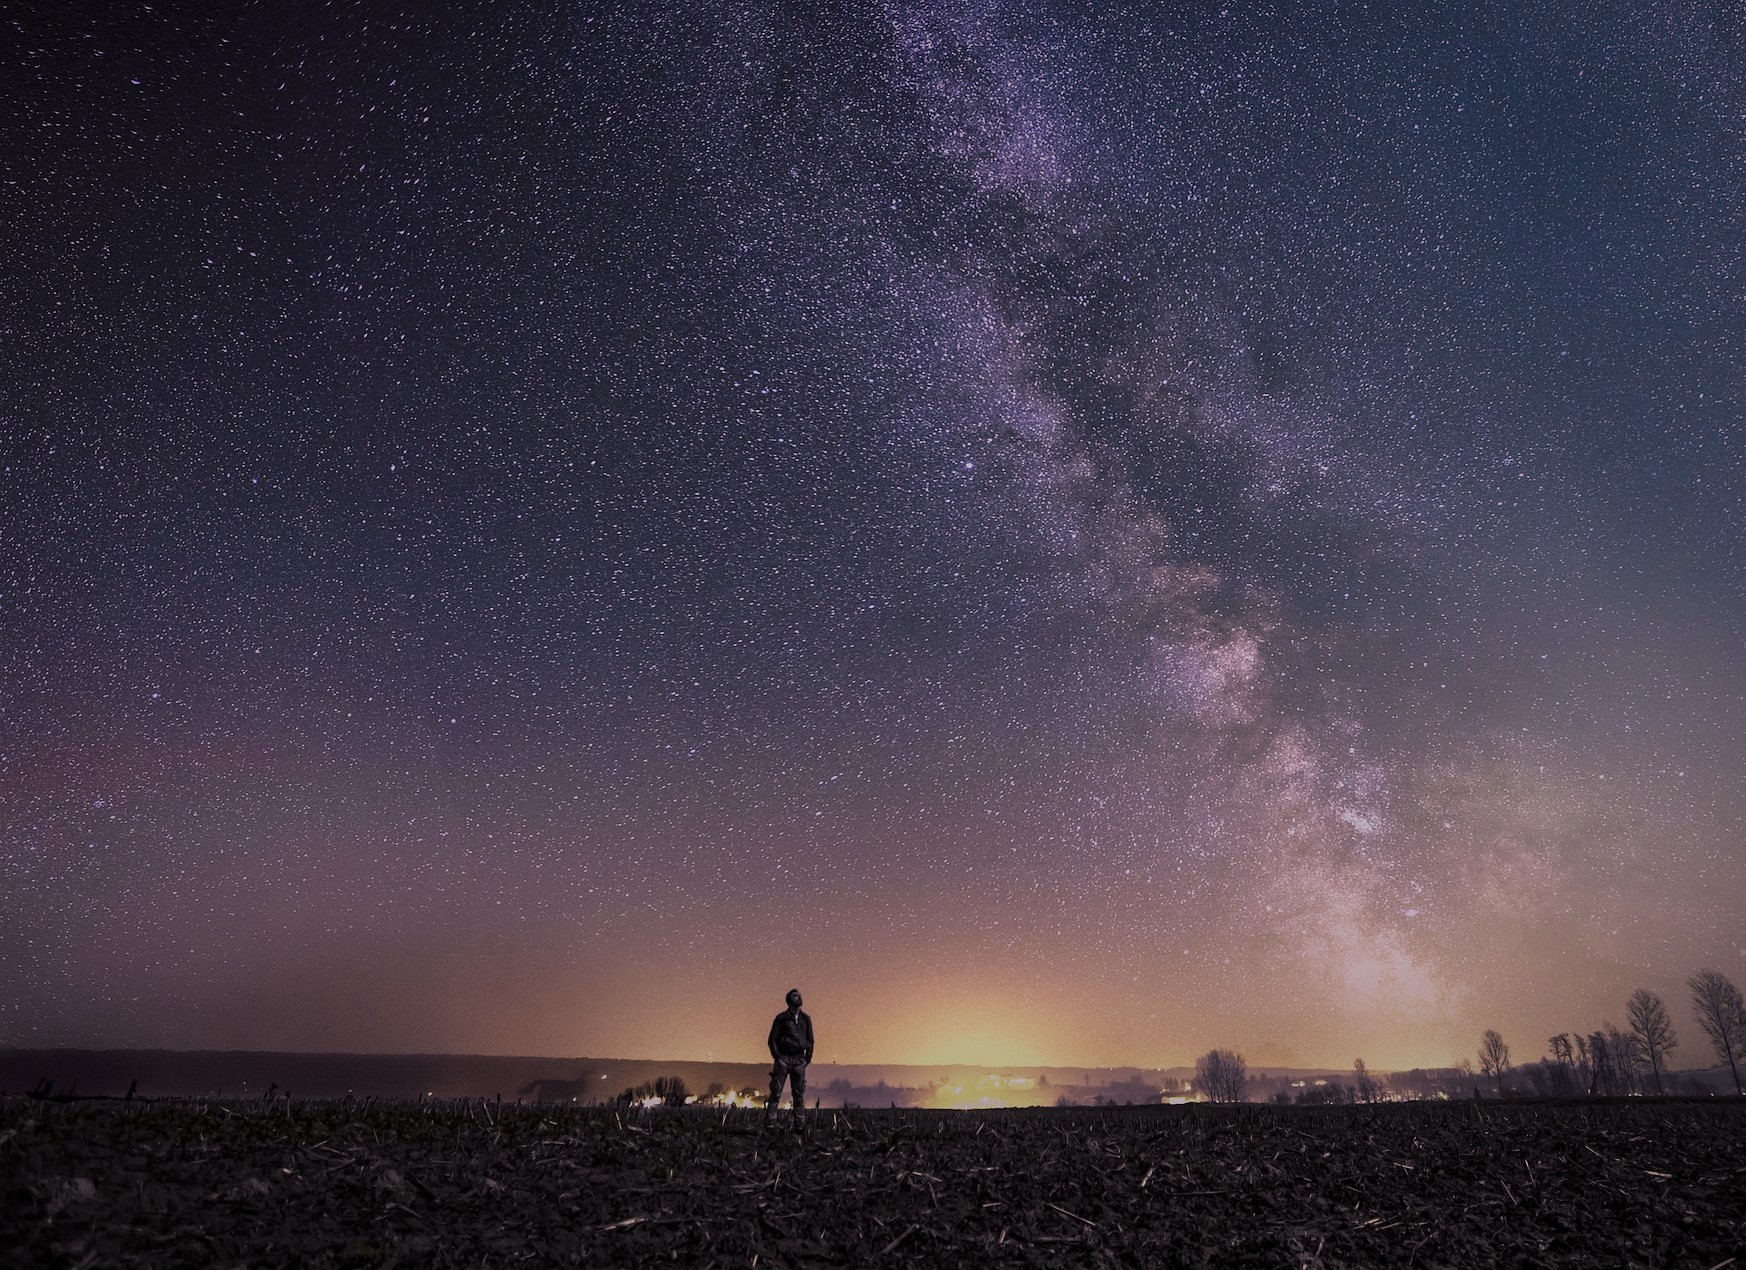 Starry sky pic.jpg